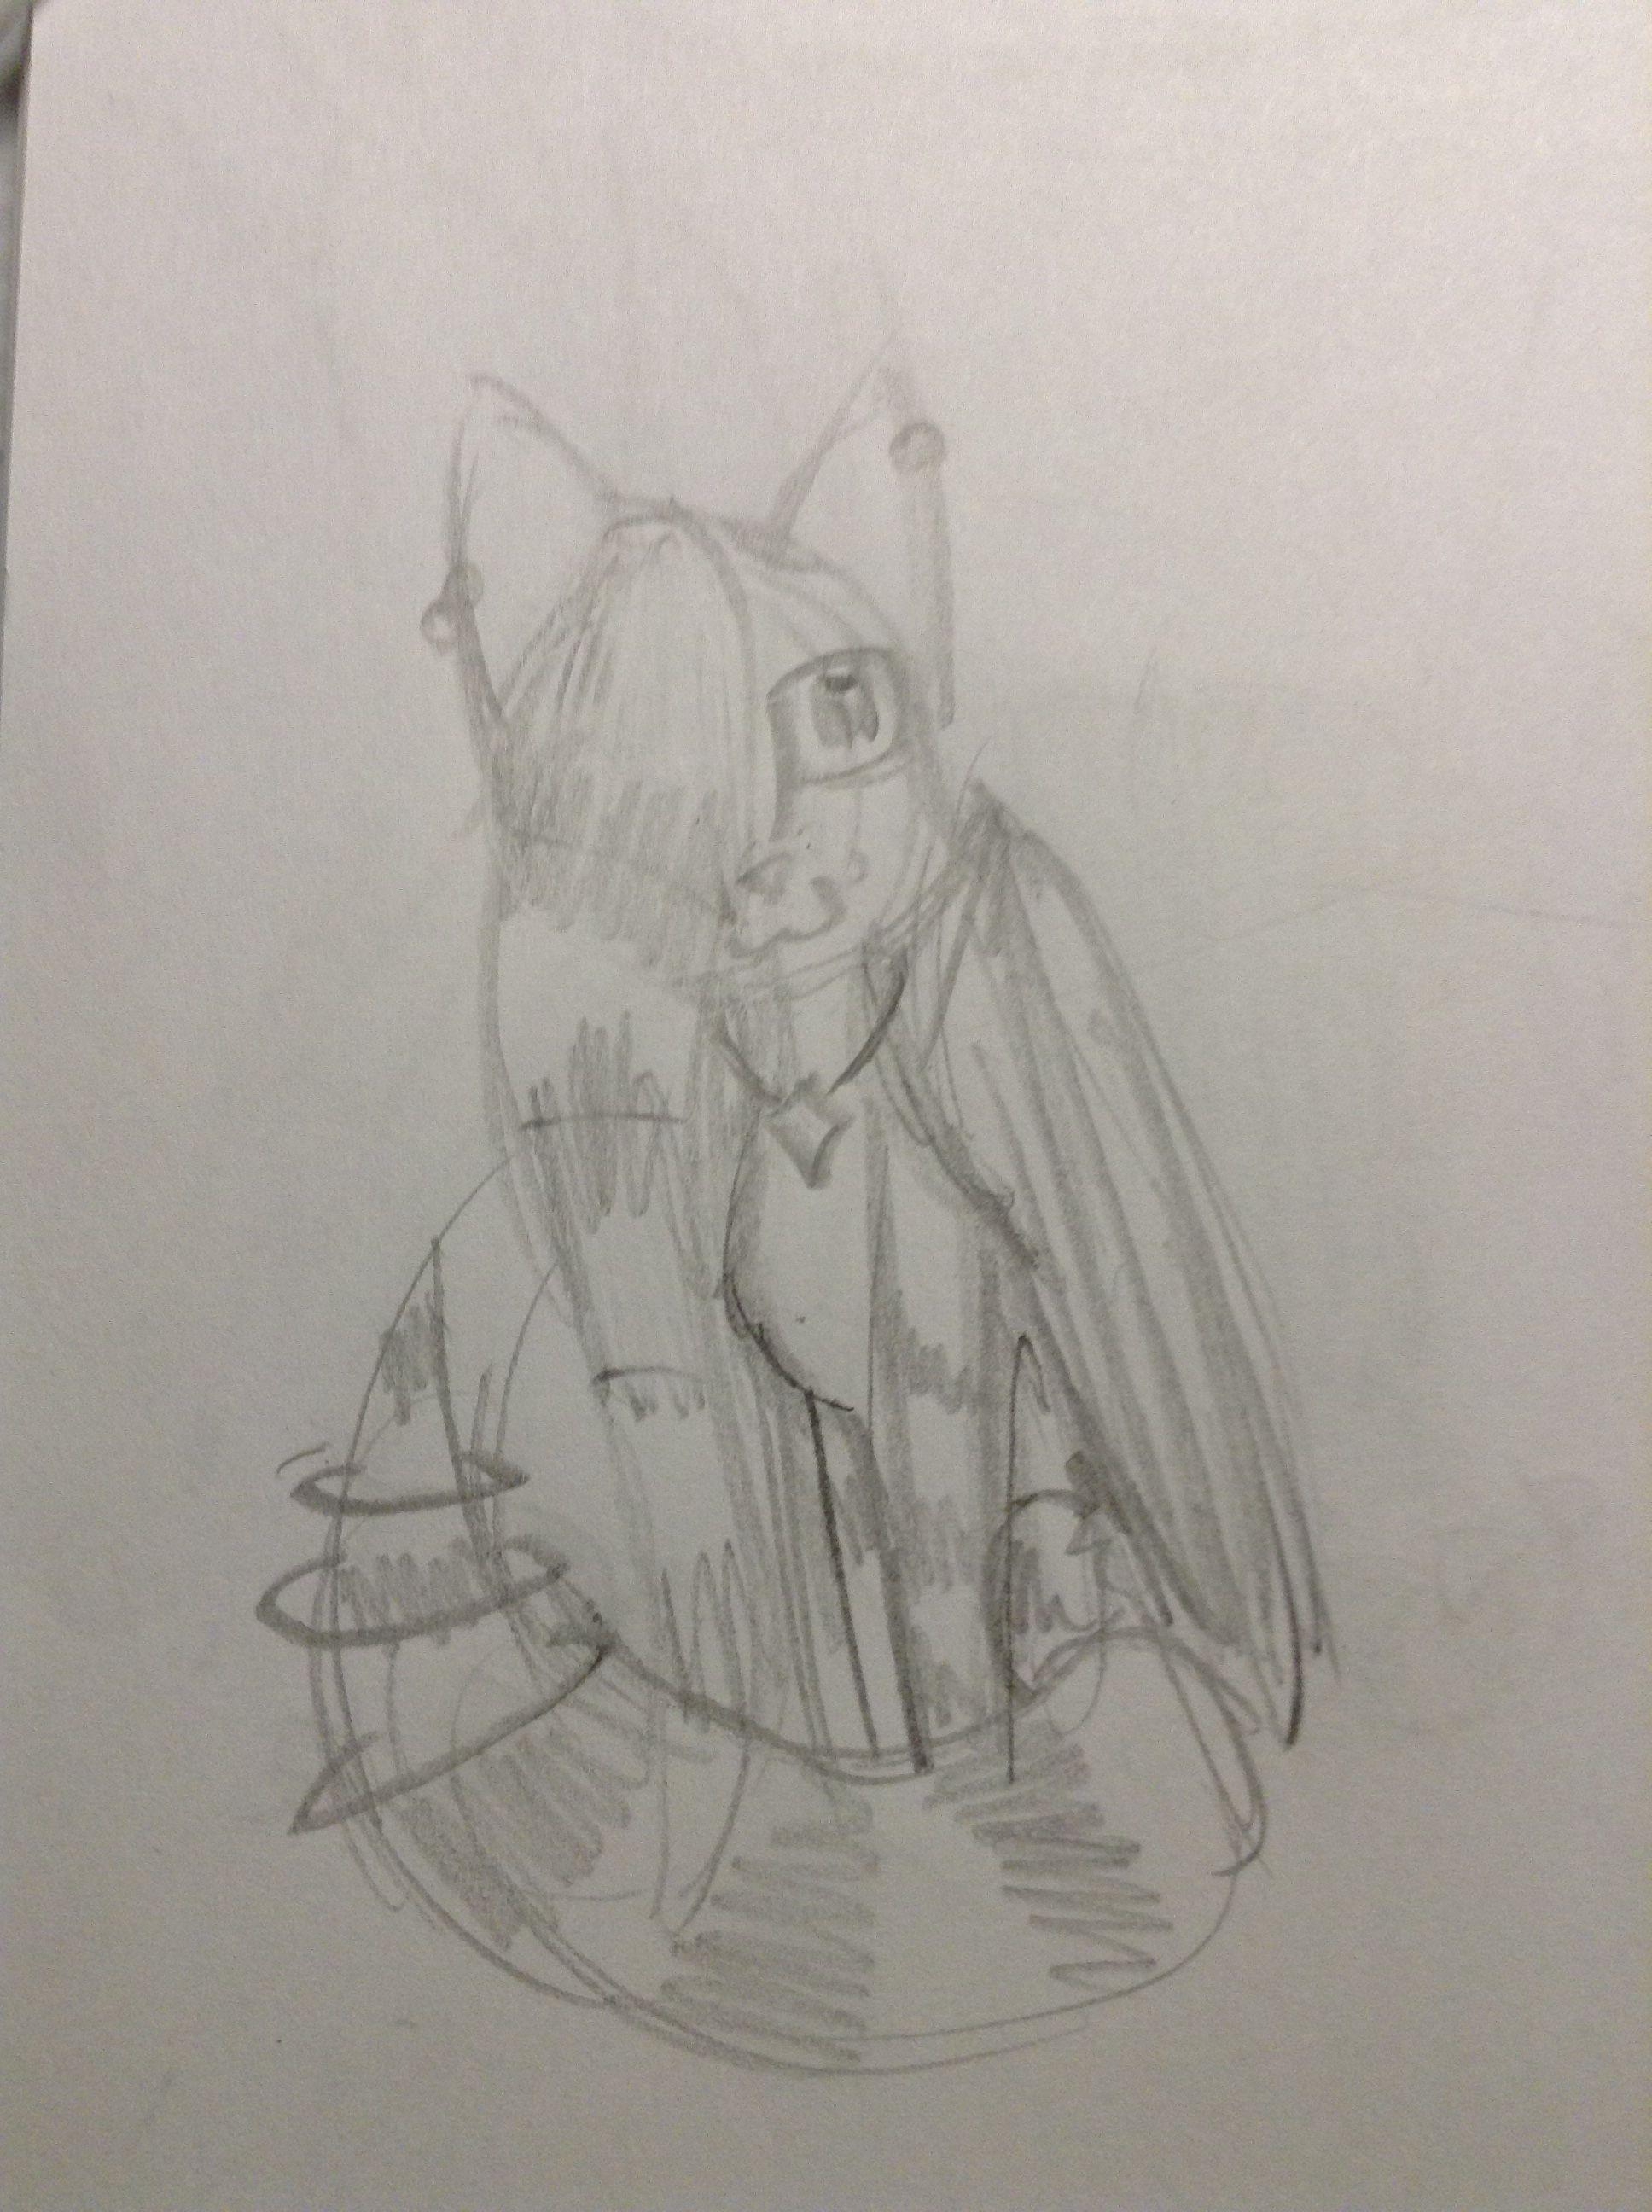 Stargaze for @swiftclan4eva . Drawn by me, @pusheen_the_cat